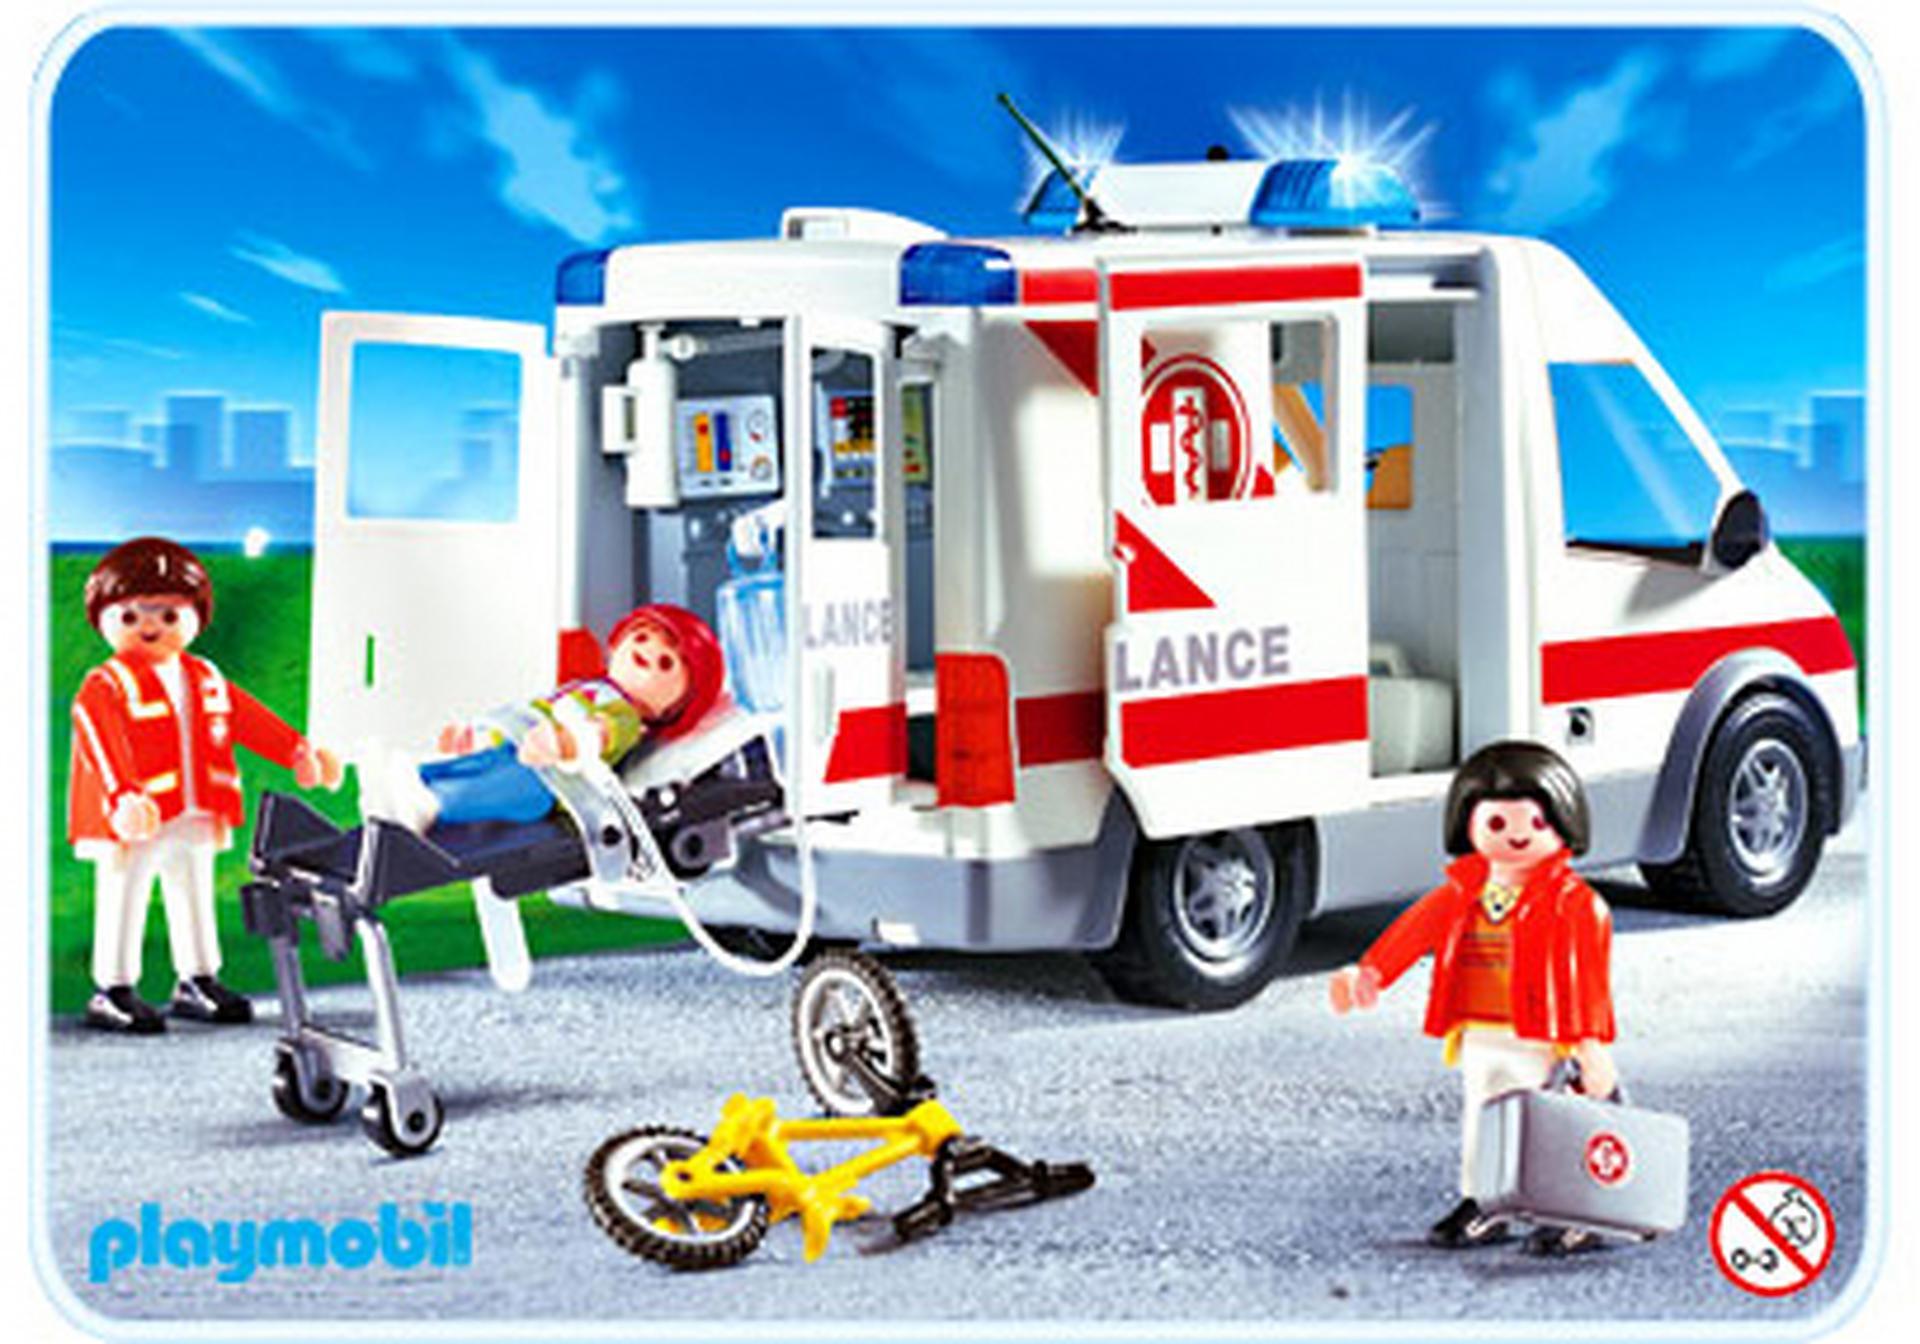 ambulanciers bless v hicule 4221 a playmobil france. Black Bedroom Furniture Sets. Home Design Ideas